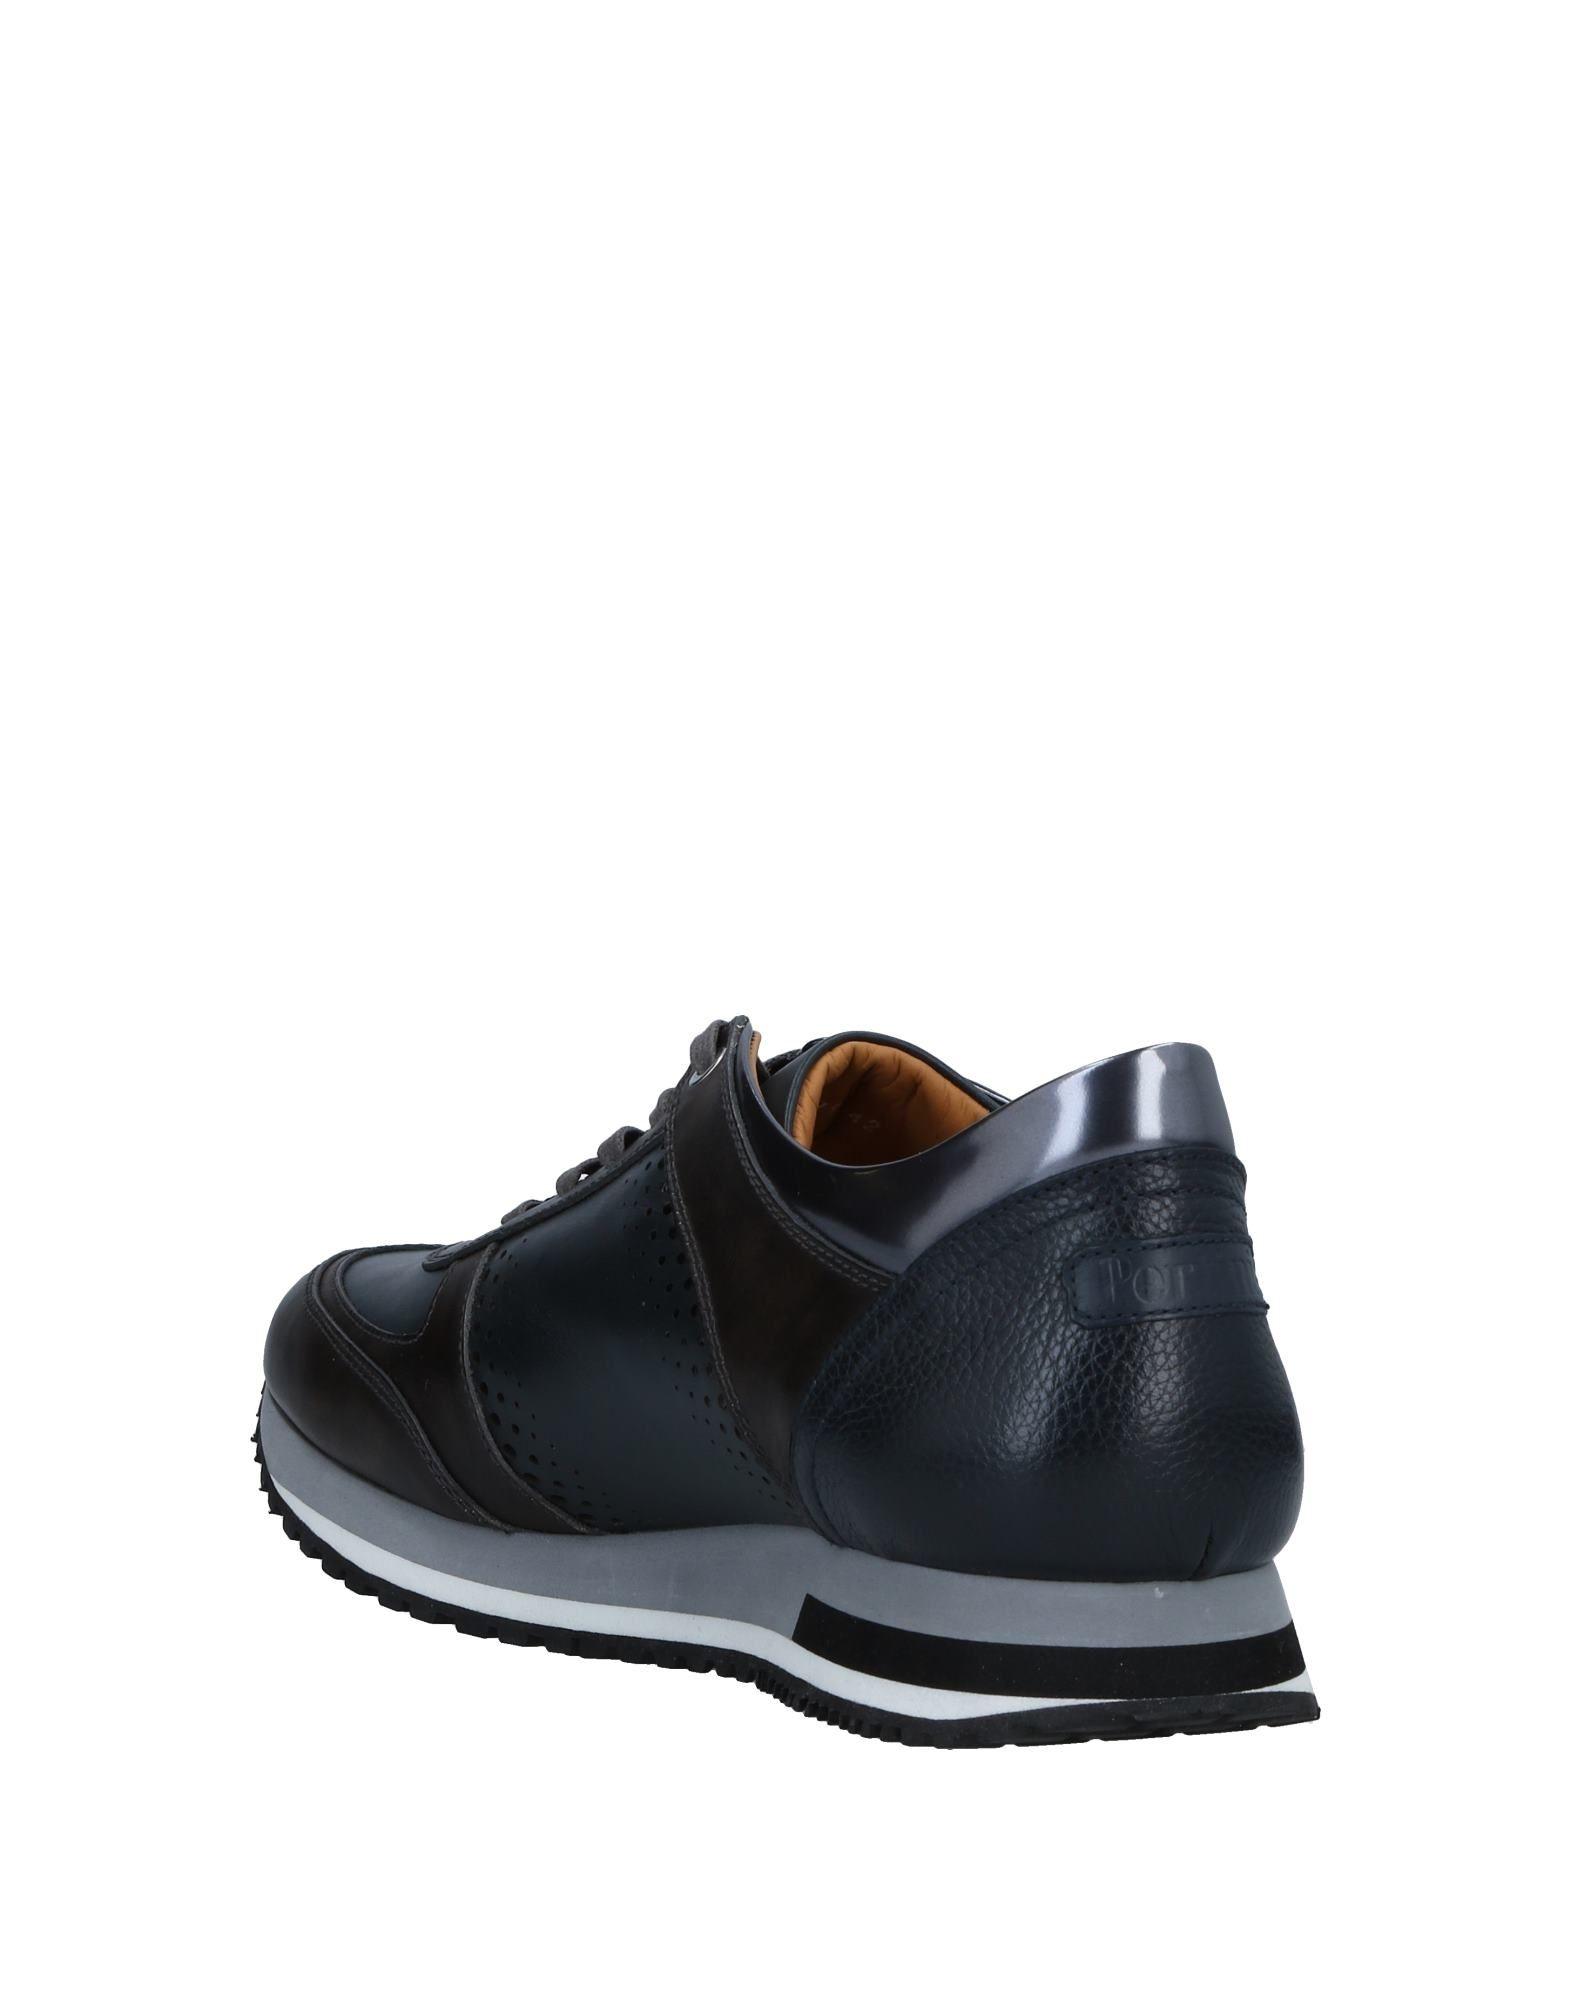 Rabatt echte Schuhe 11534450HF Pertini Sneakers Herren  11534450HF Schuhe 8b4777